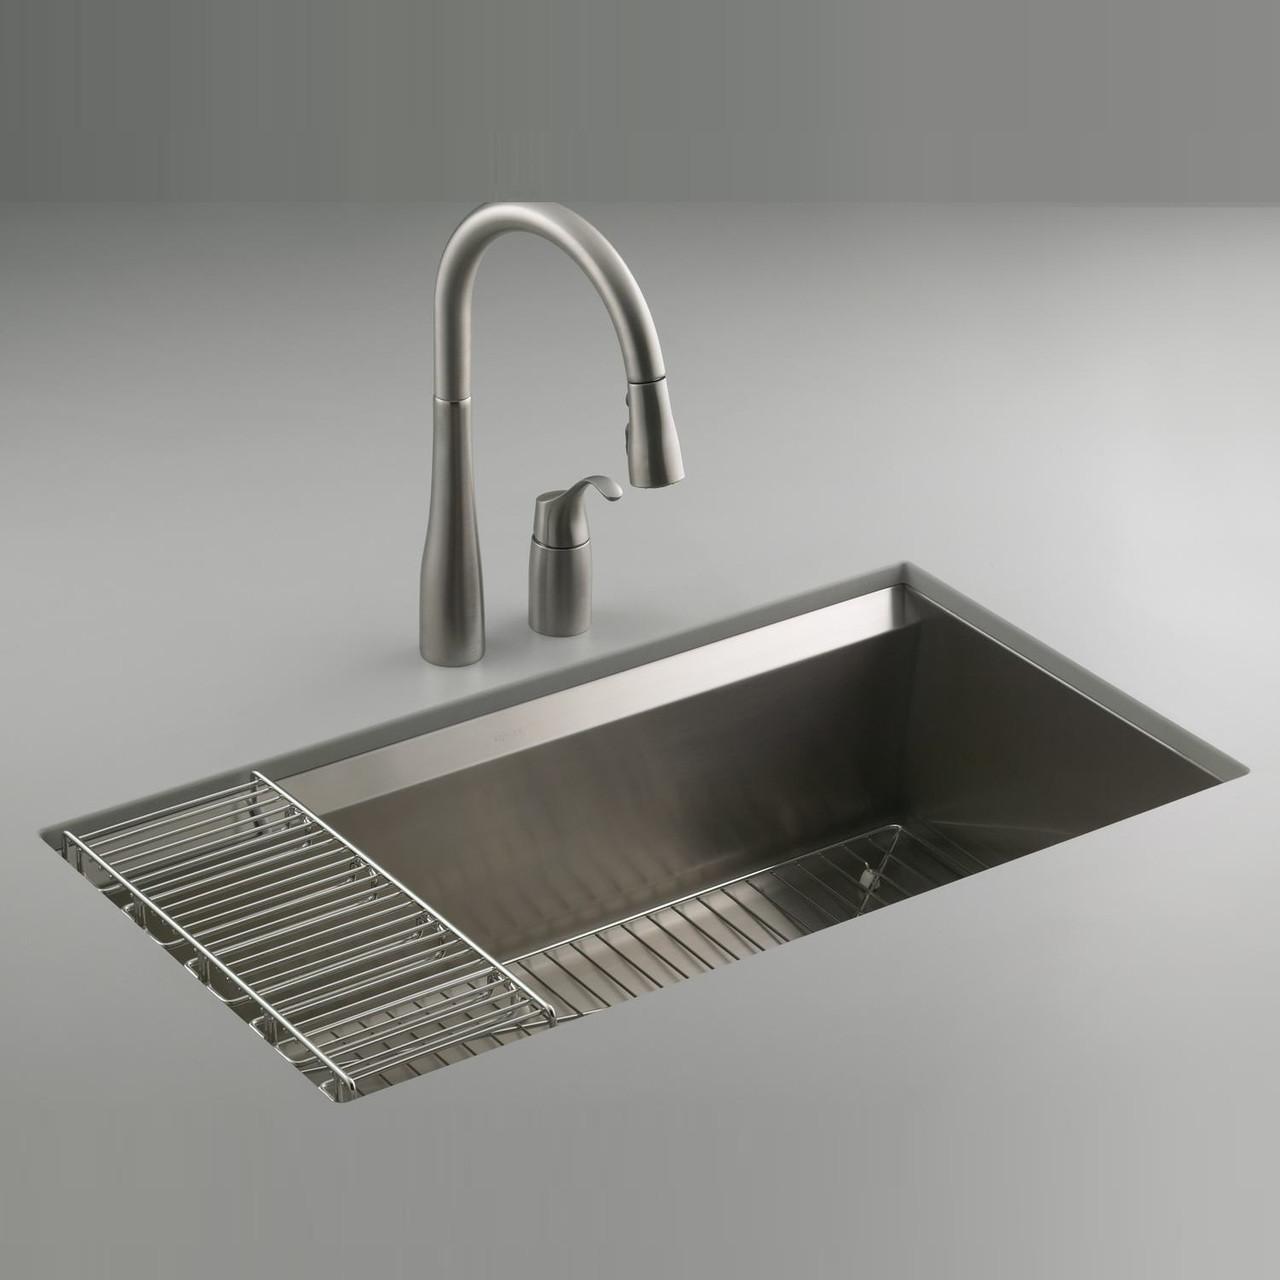 Kohler 8 Degree Single Bowl Kitchen Sink